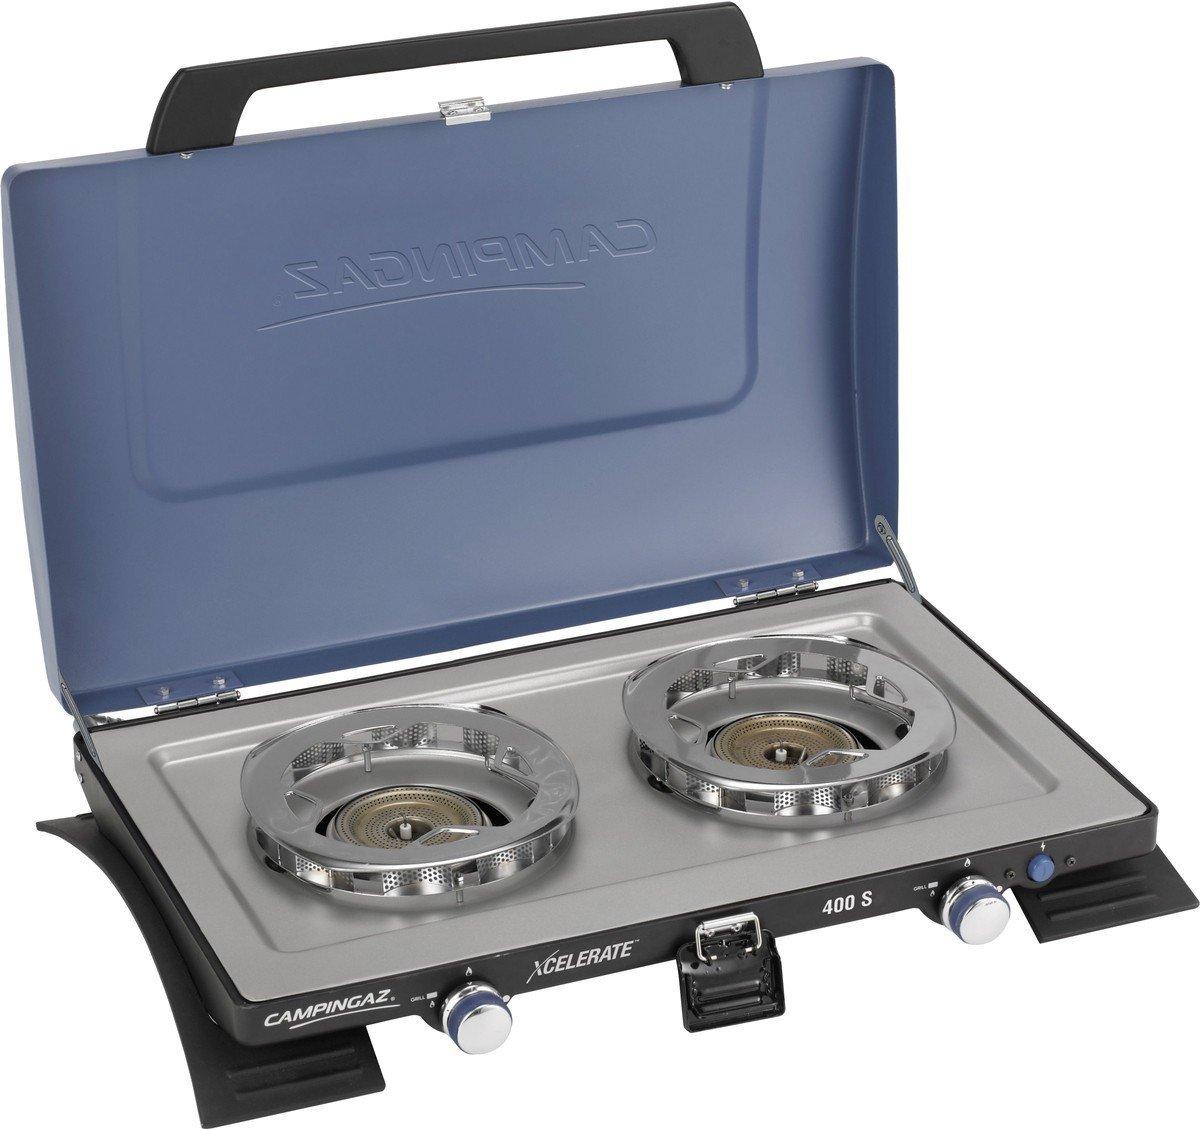 Campingaz Campingaz 400 S Gas Cooker - 2000032227